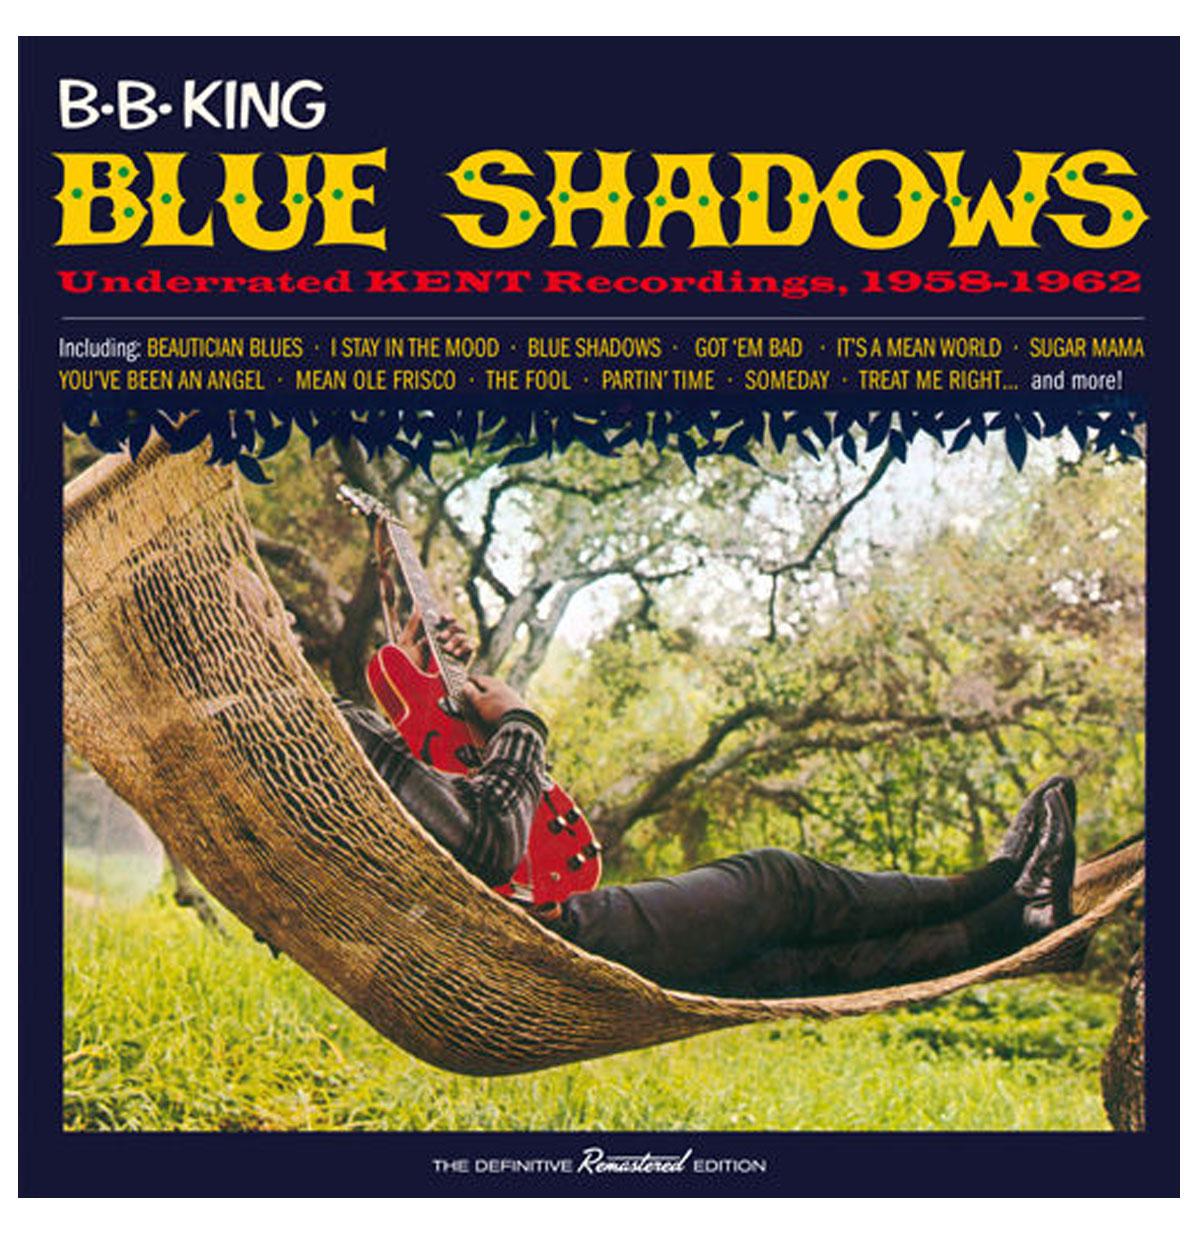 B.B. King - Blue Shadows LP Beperkte Oplage